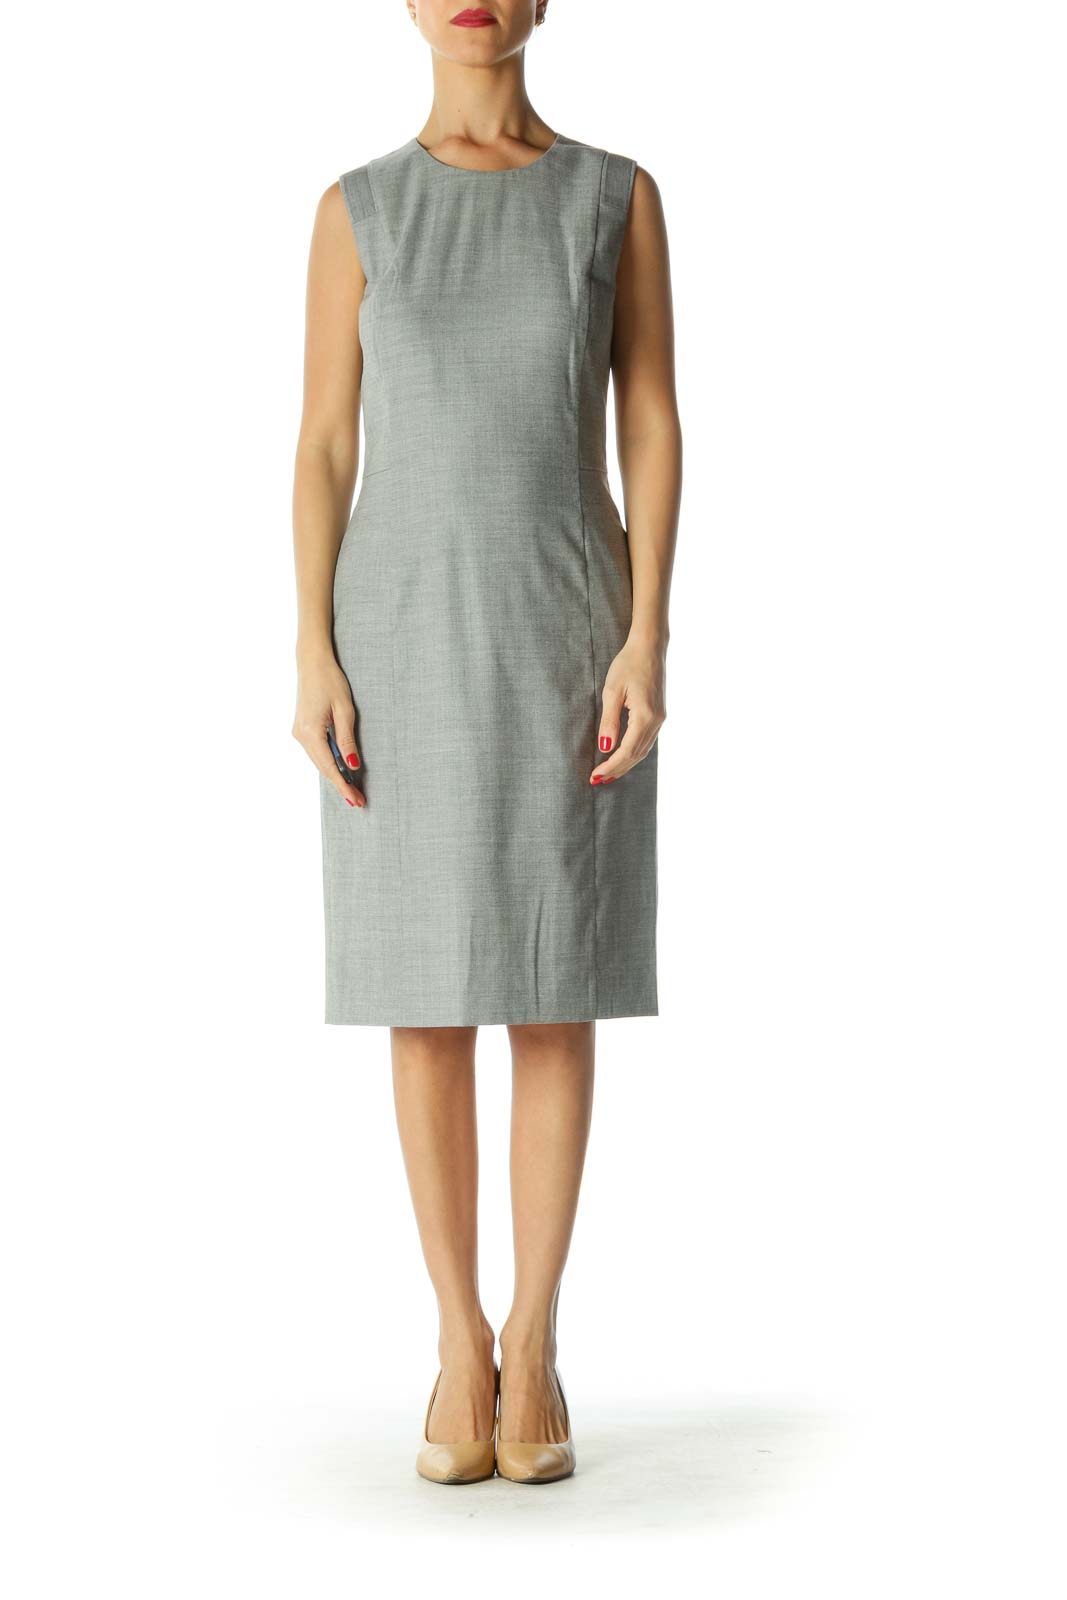 Gray Twill Sheath Dress Front